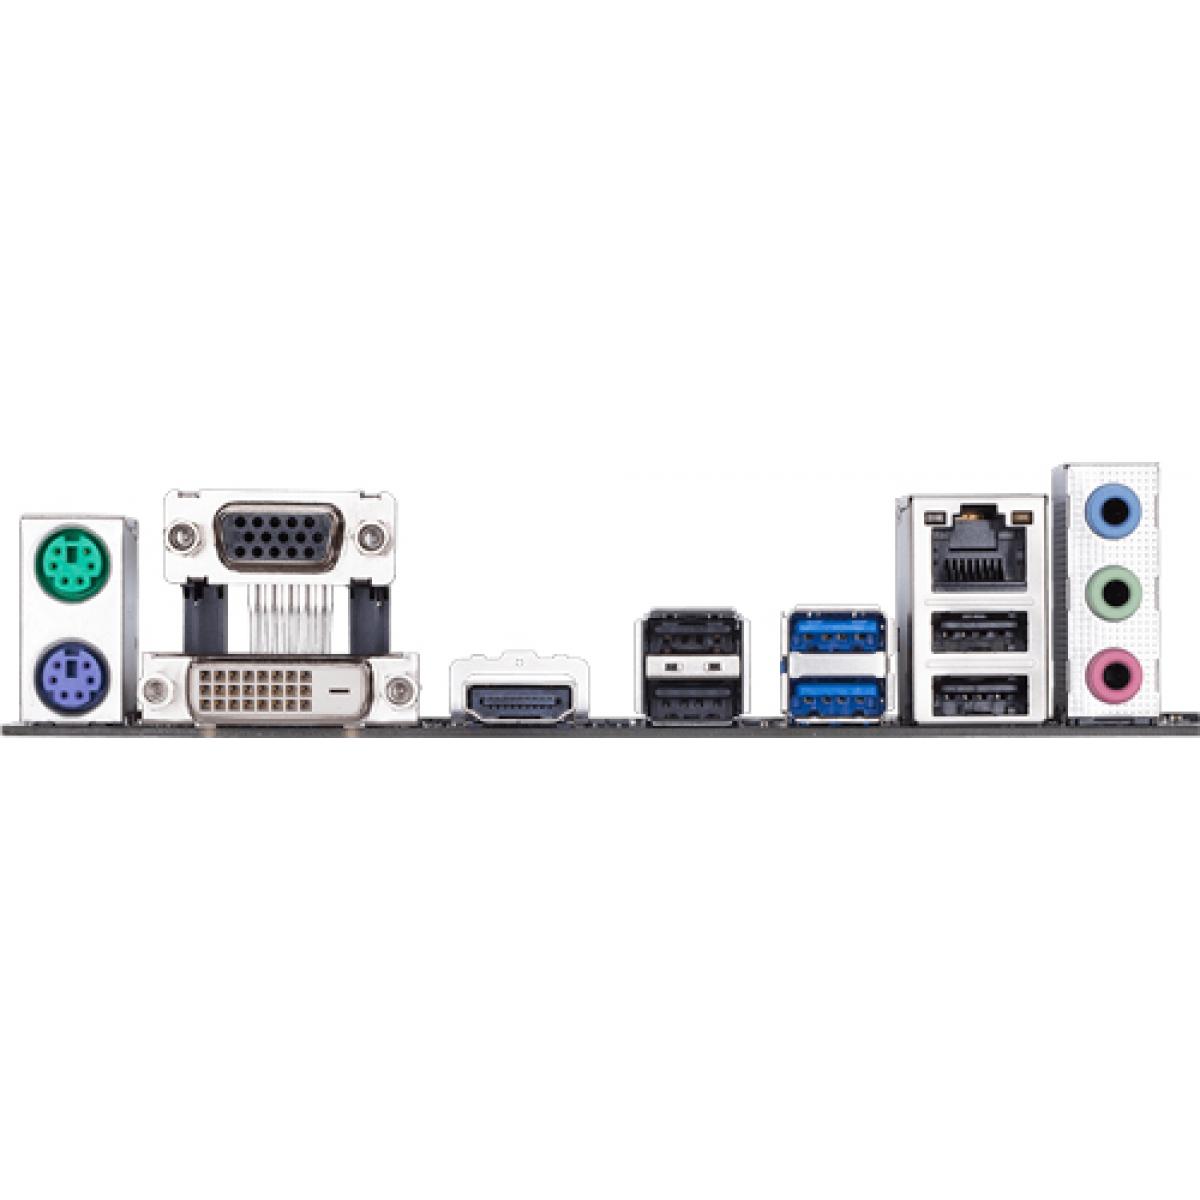 Placa Mãe Gigabyte H310M S2H, Chipset H310, Intel LGA 1151, mATX, DDR4 - Open Box